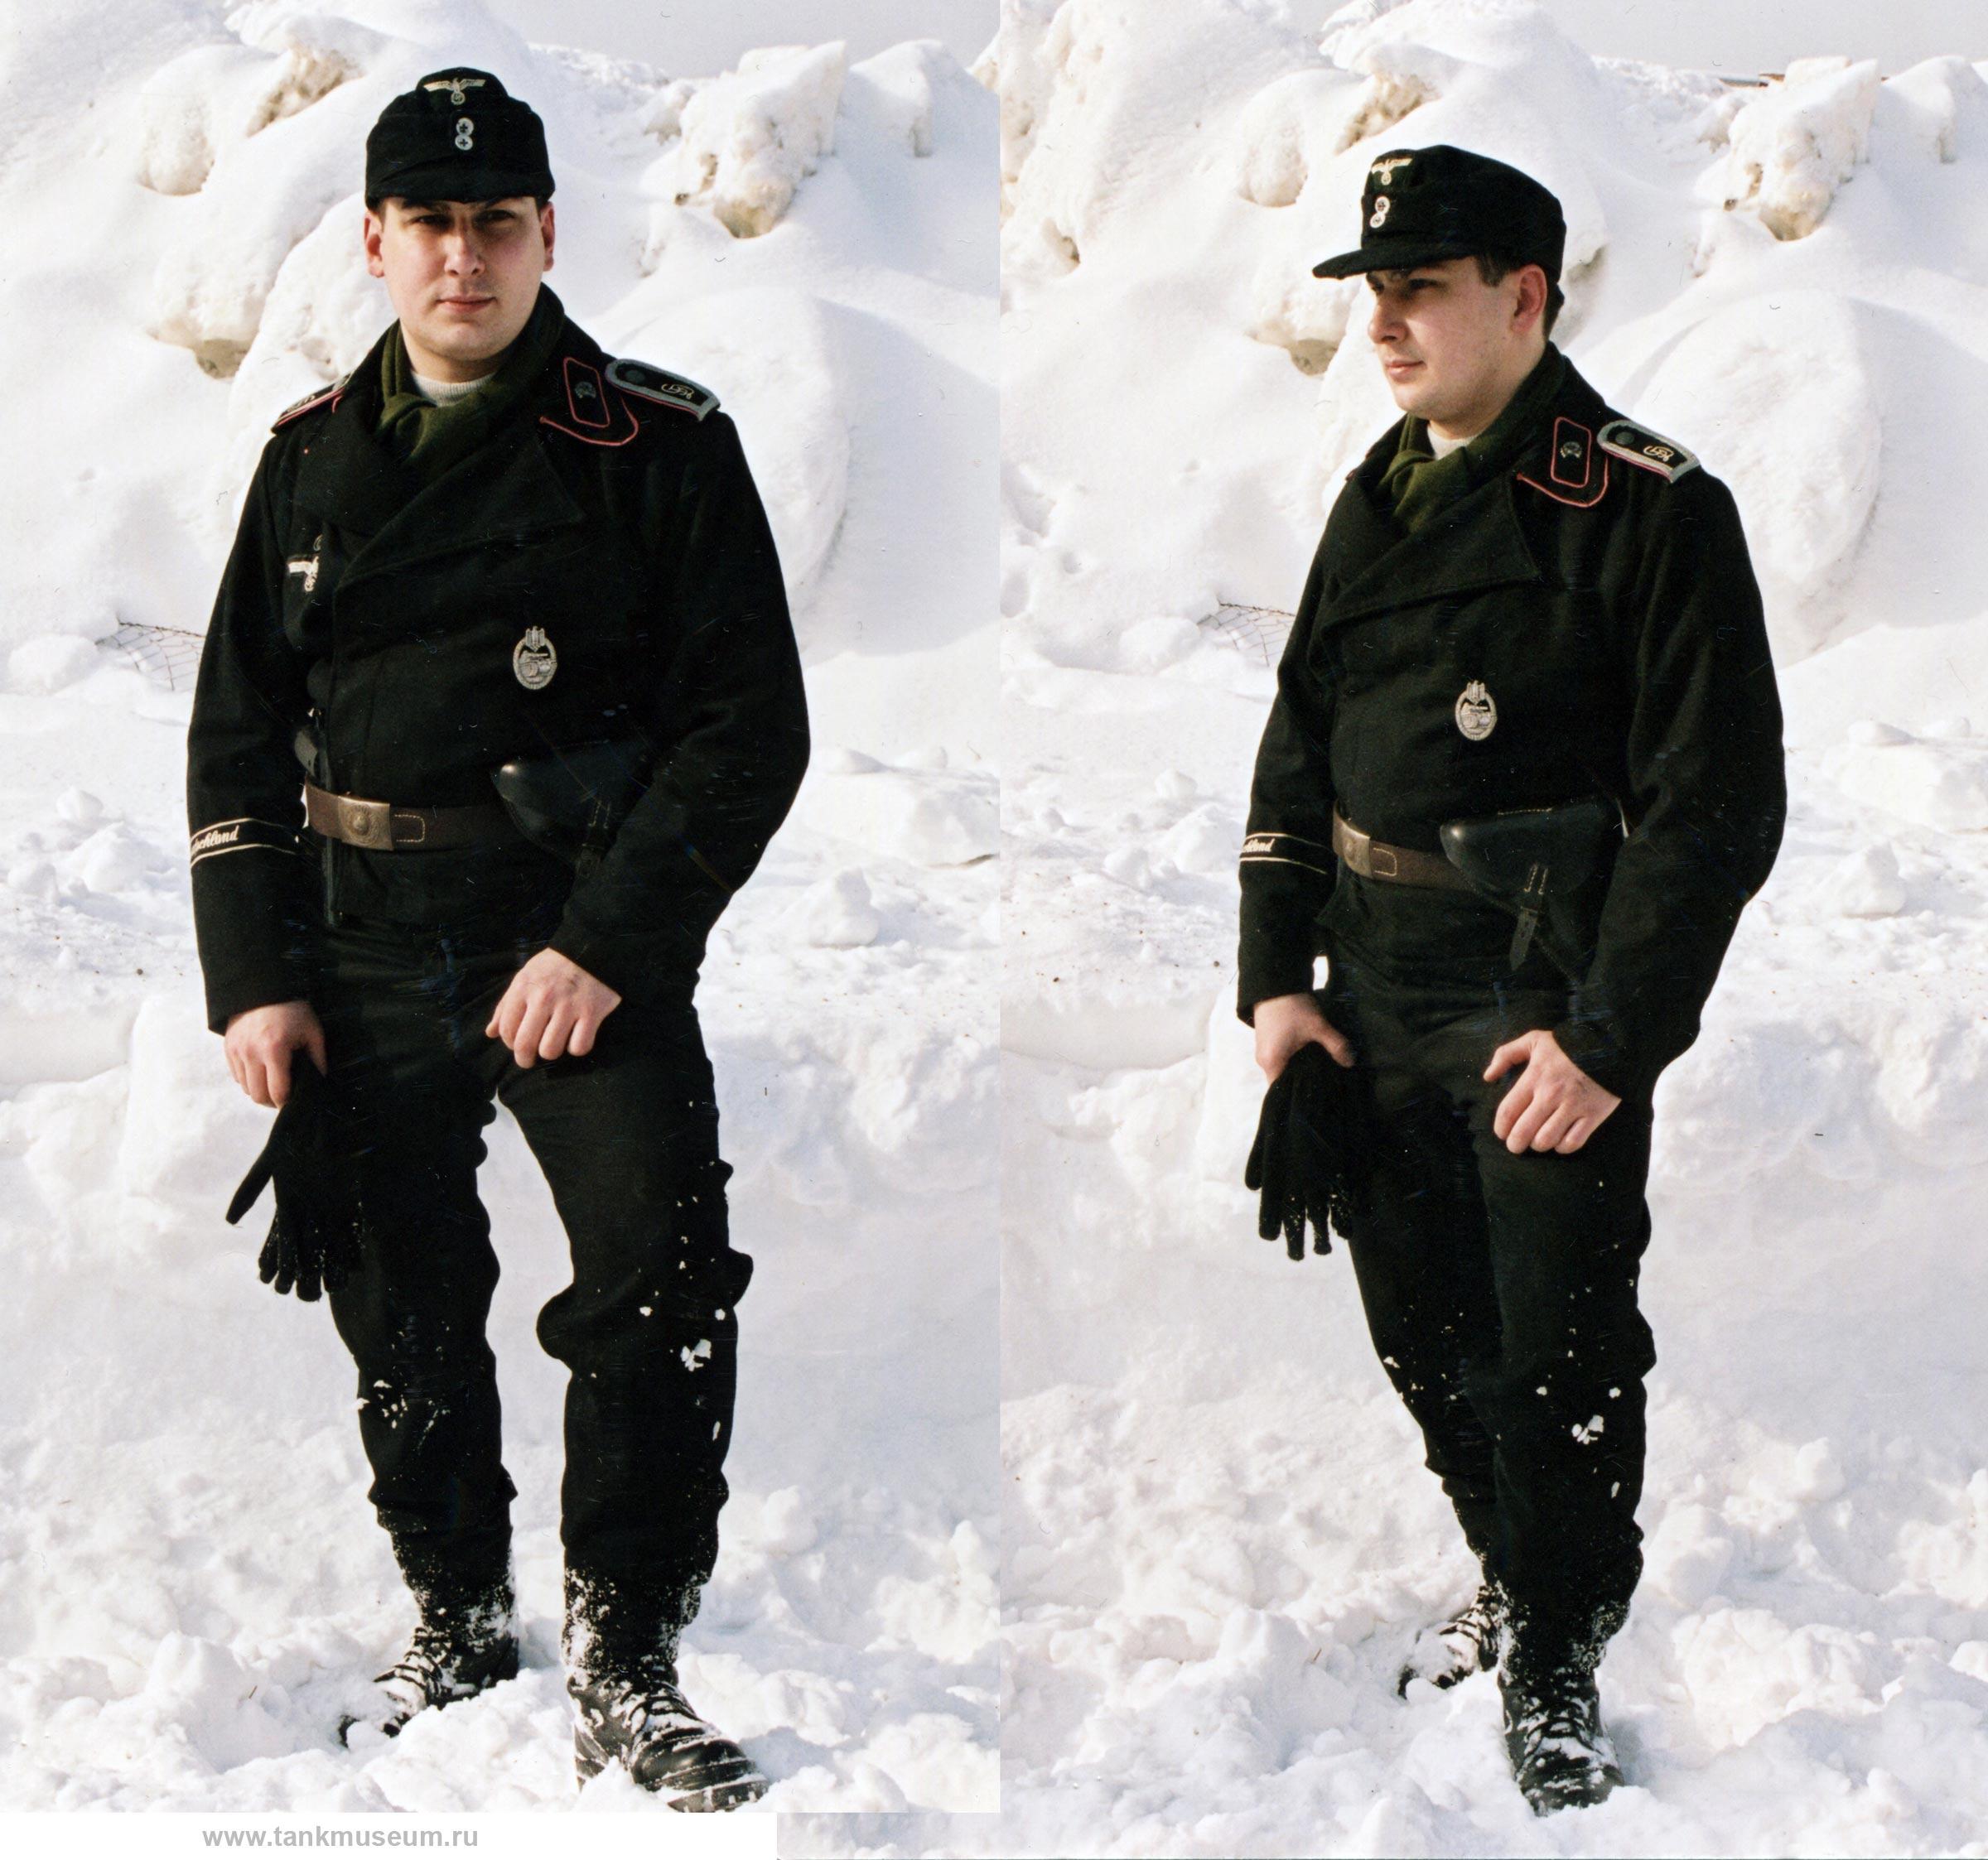 Униформа танкистов Вермахта на 1943 год. Реконструкция